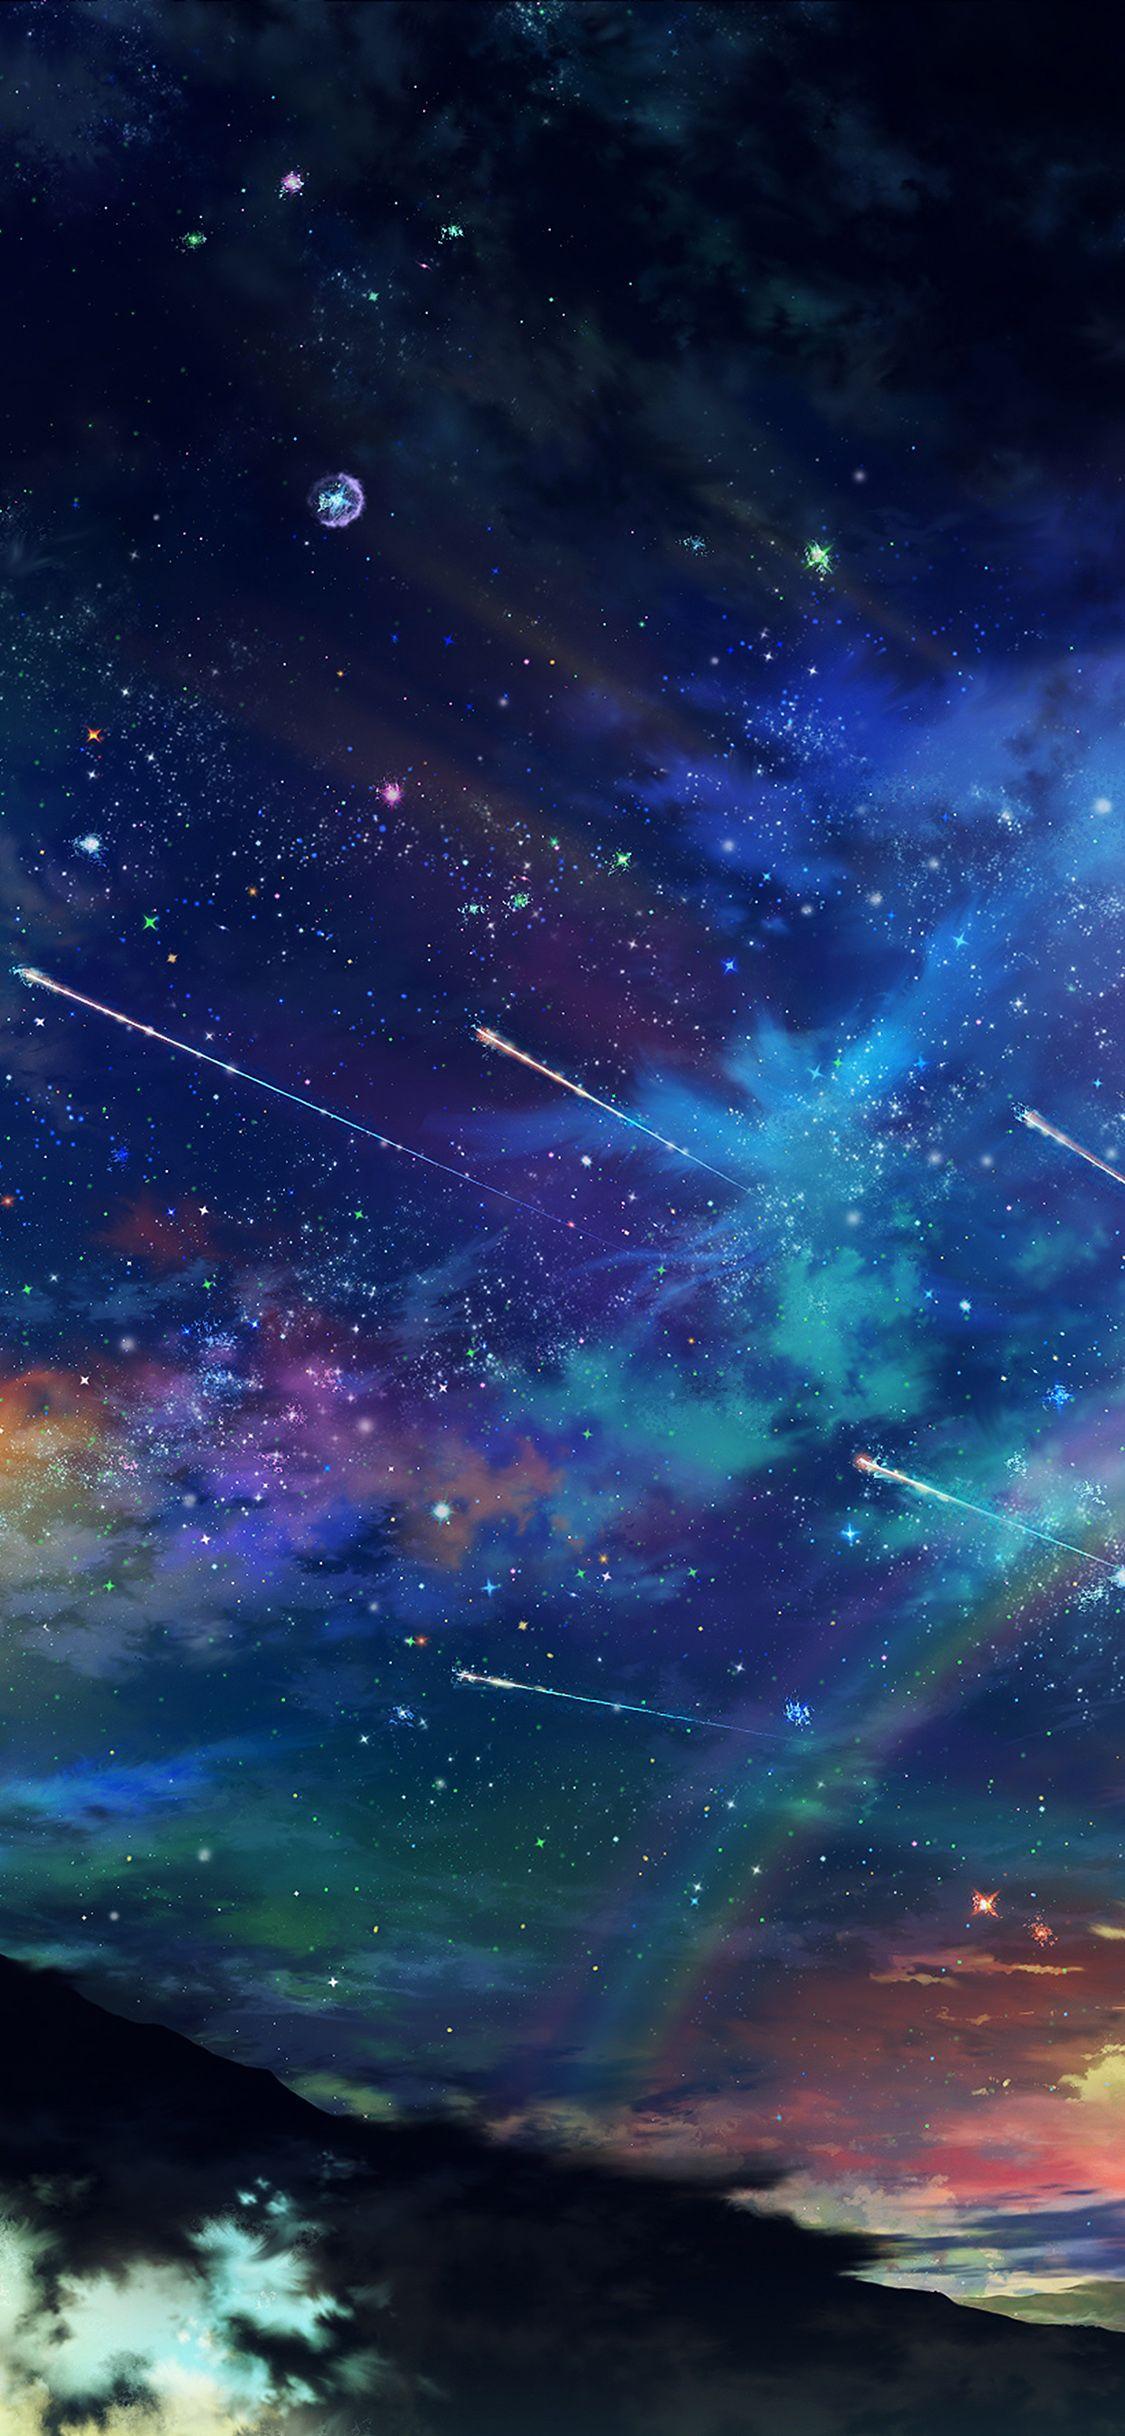 Iphonex Wallpaper Am61 Amazing Wonderful Tonight Sky Dark Star